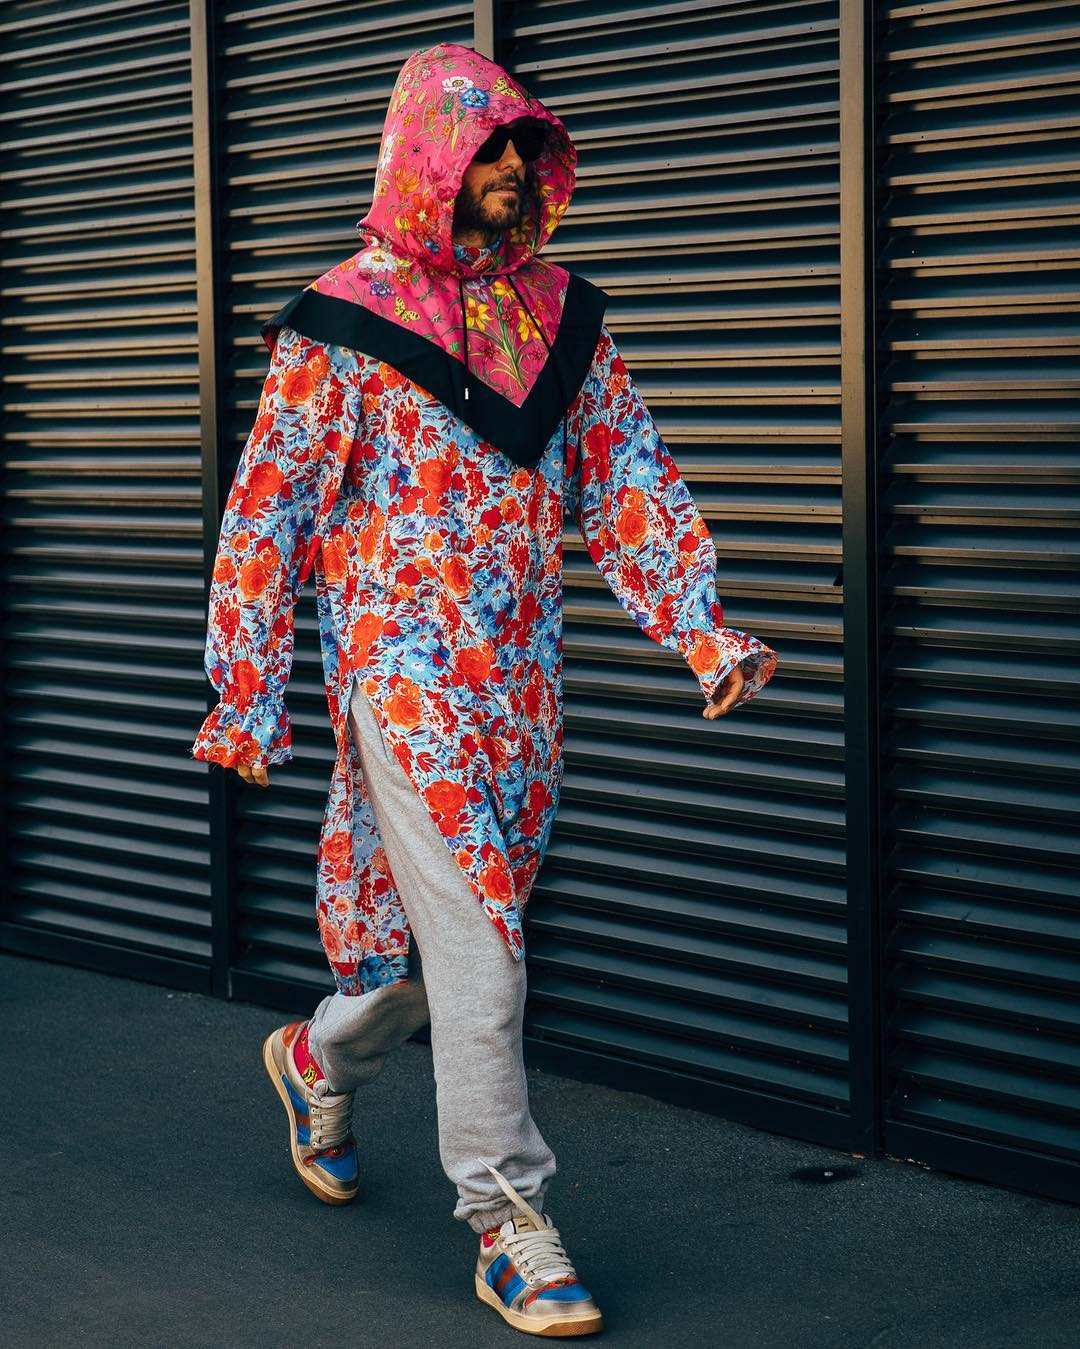 Man walking wearing Gucci